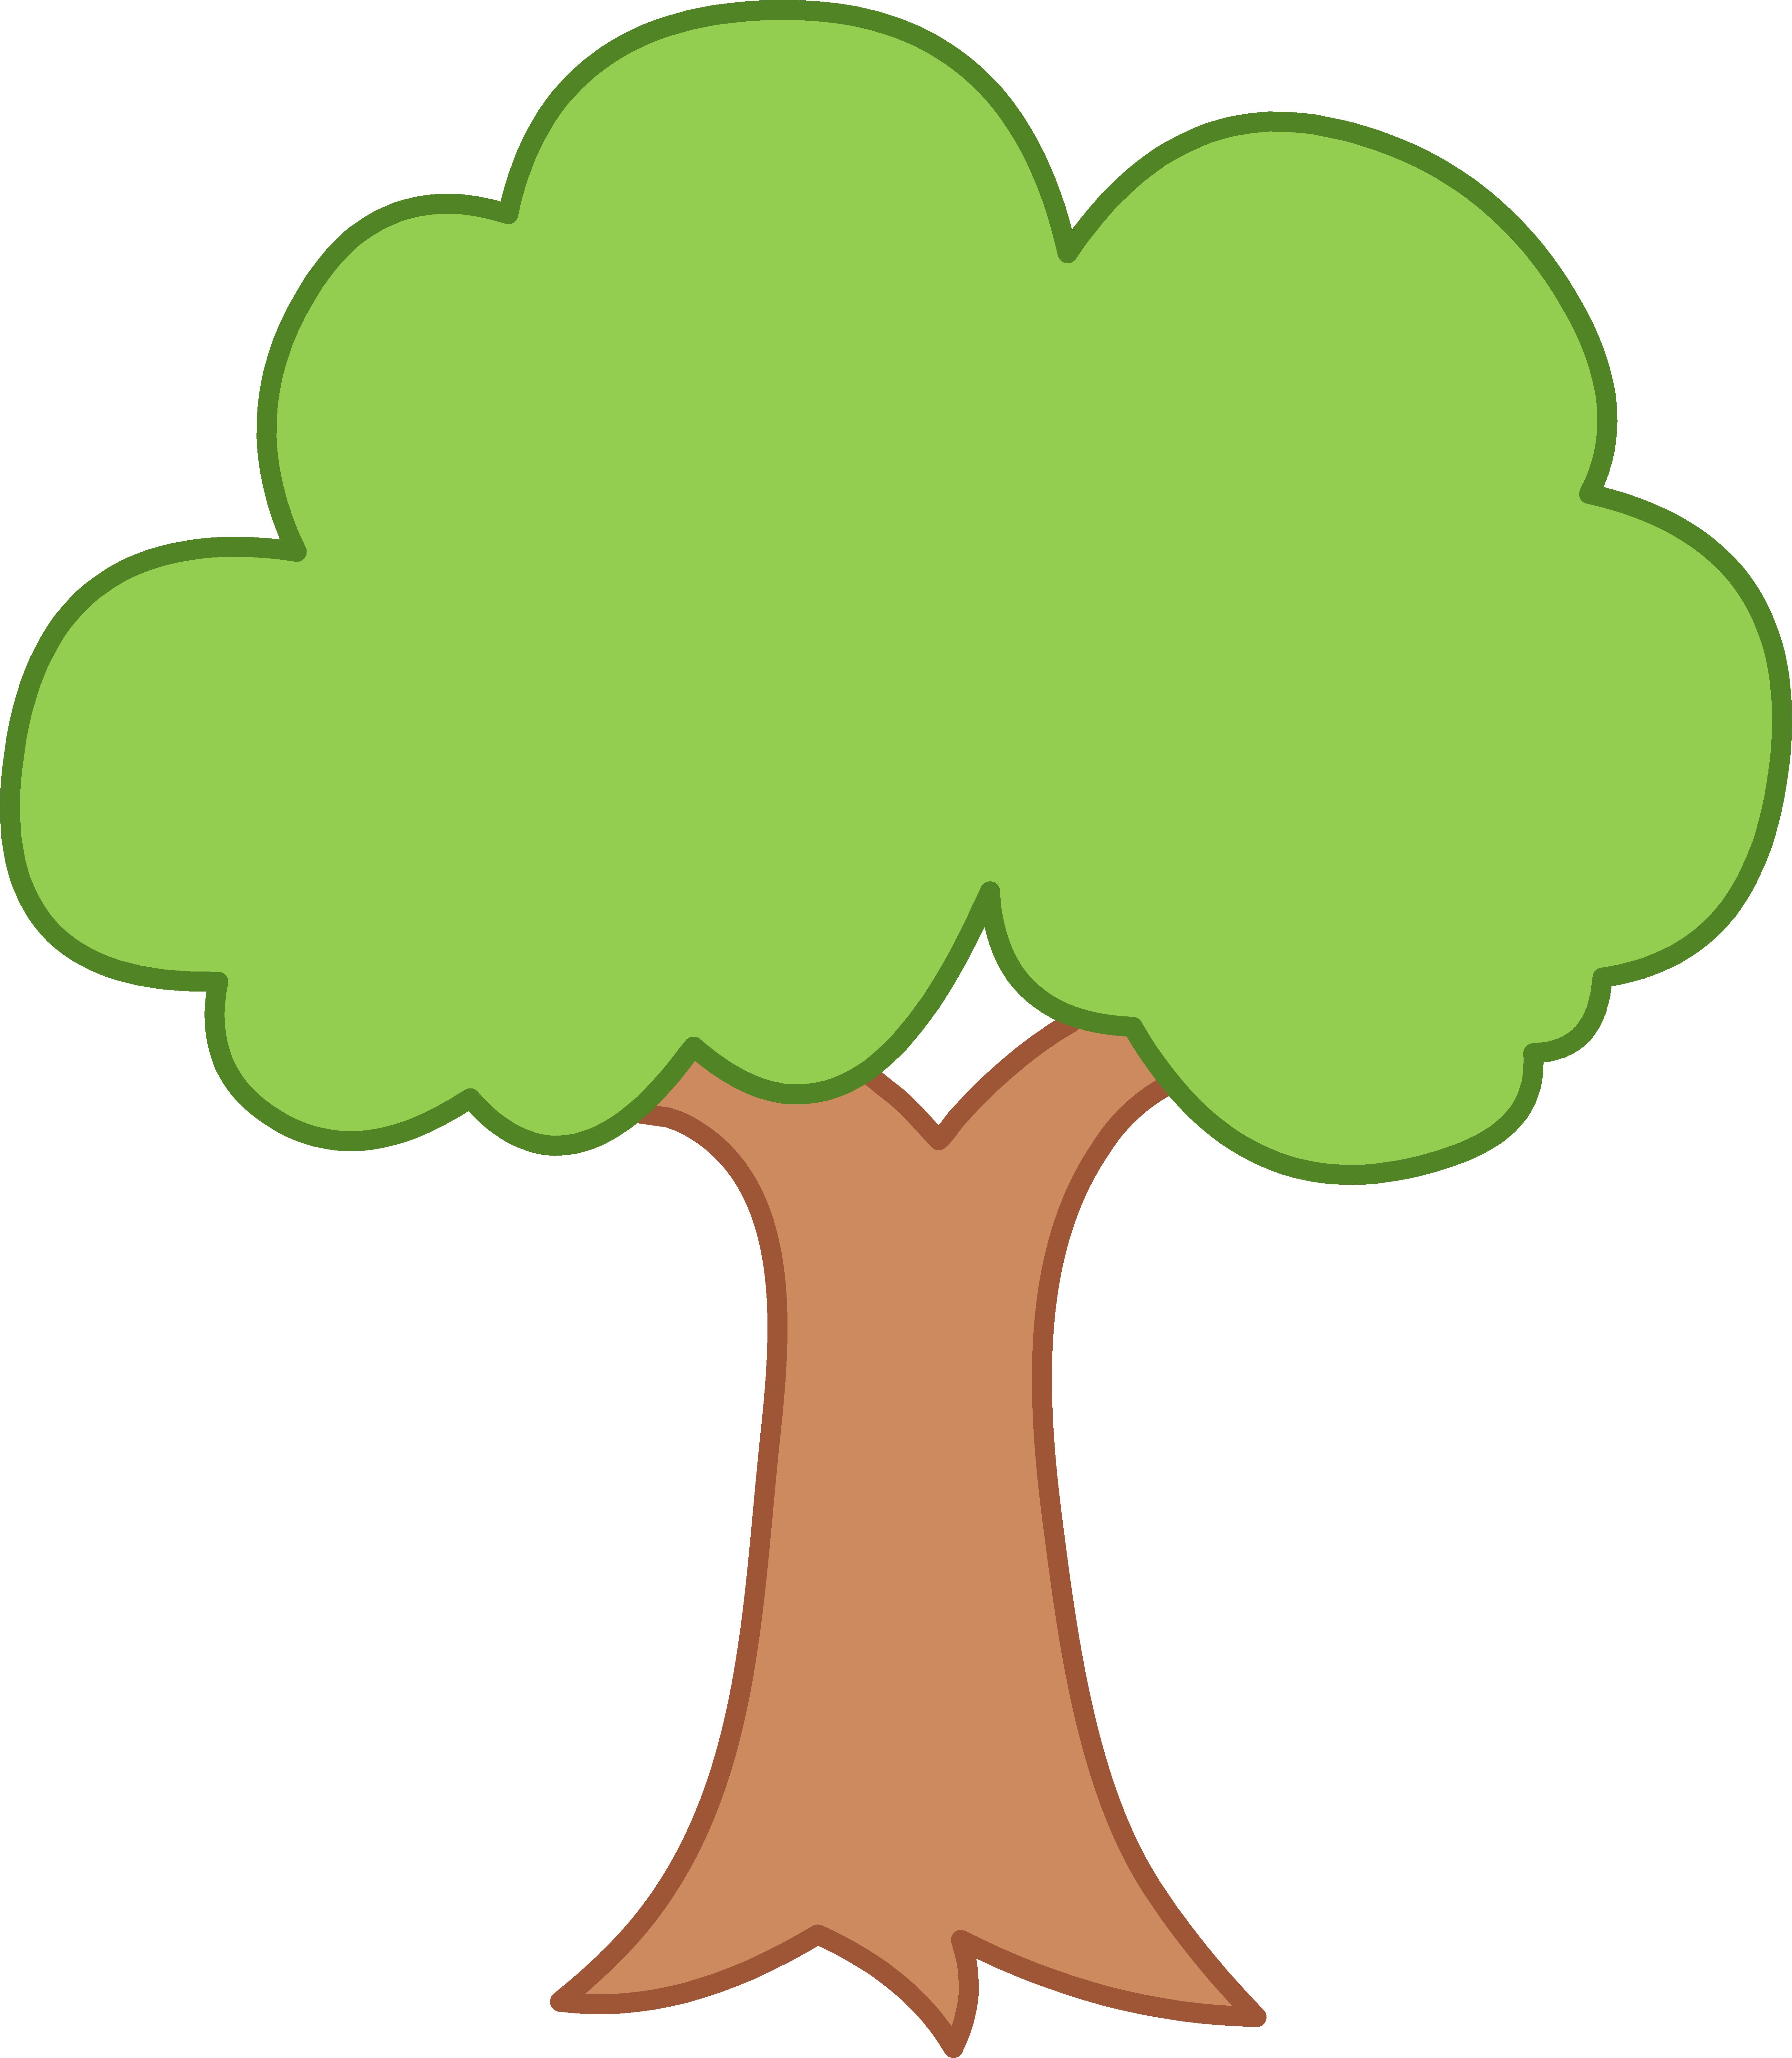 5548x6372 35 Green Tree Clipart. Clipart Panda